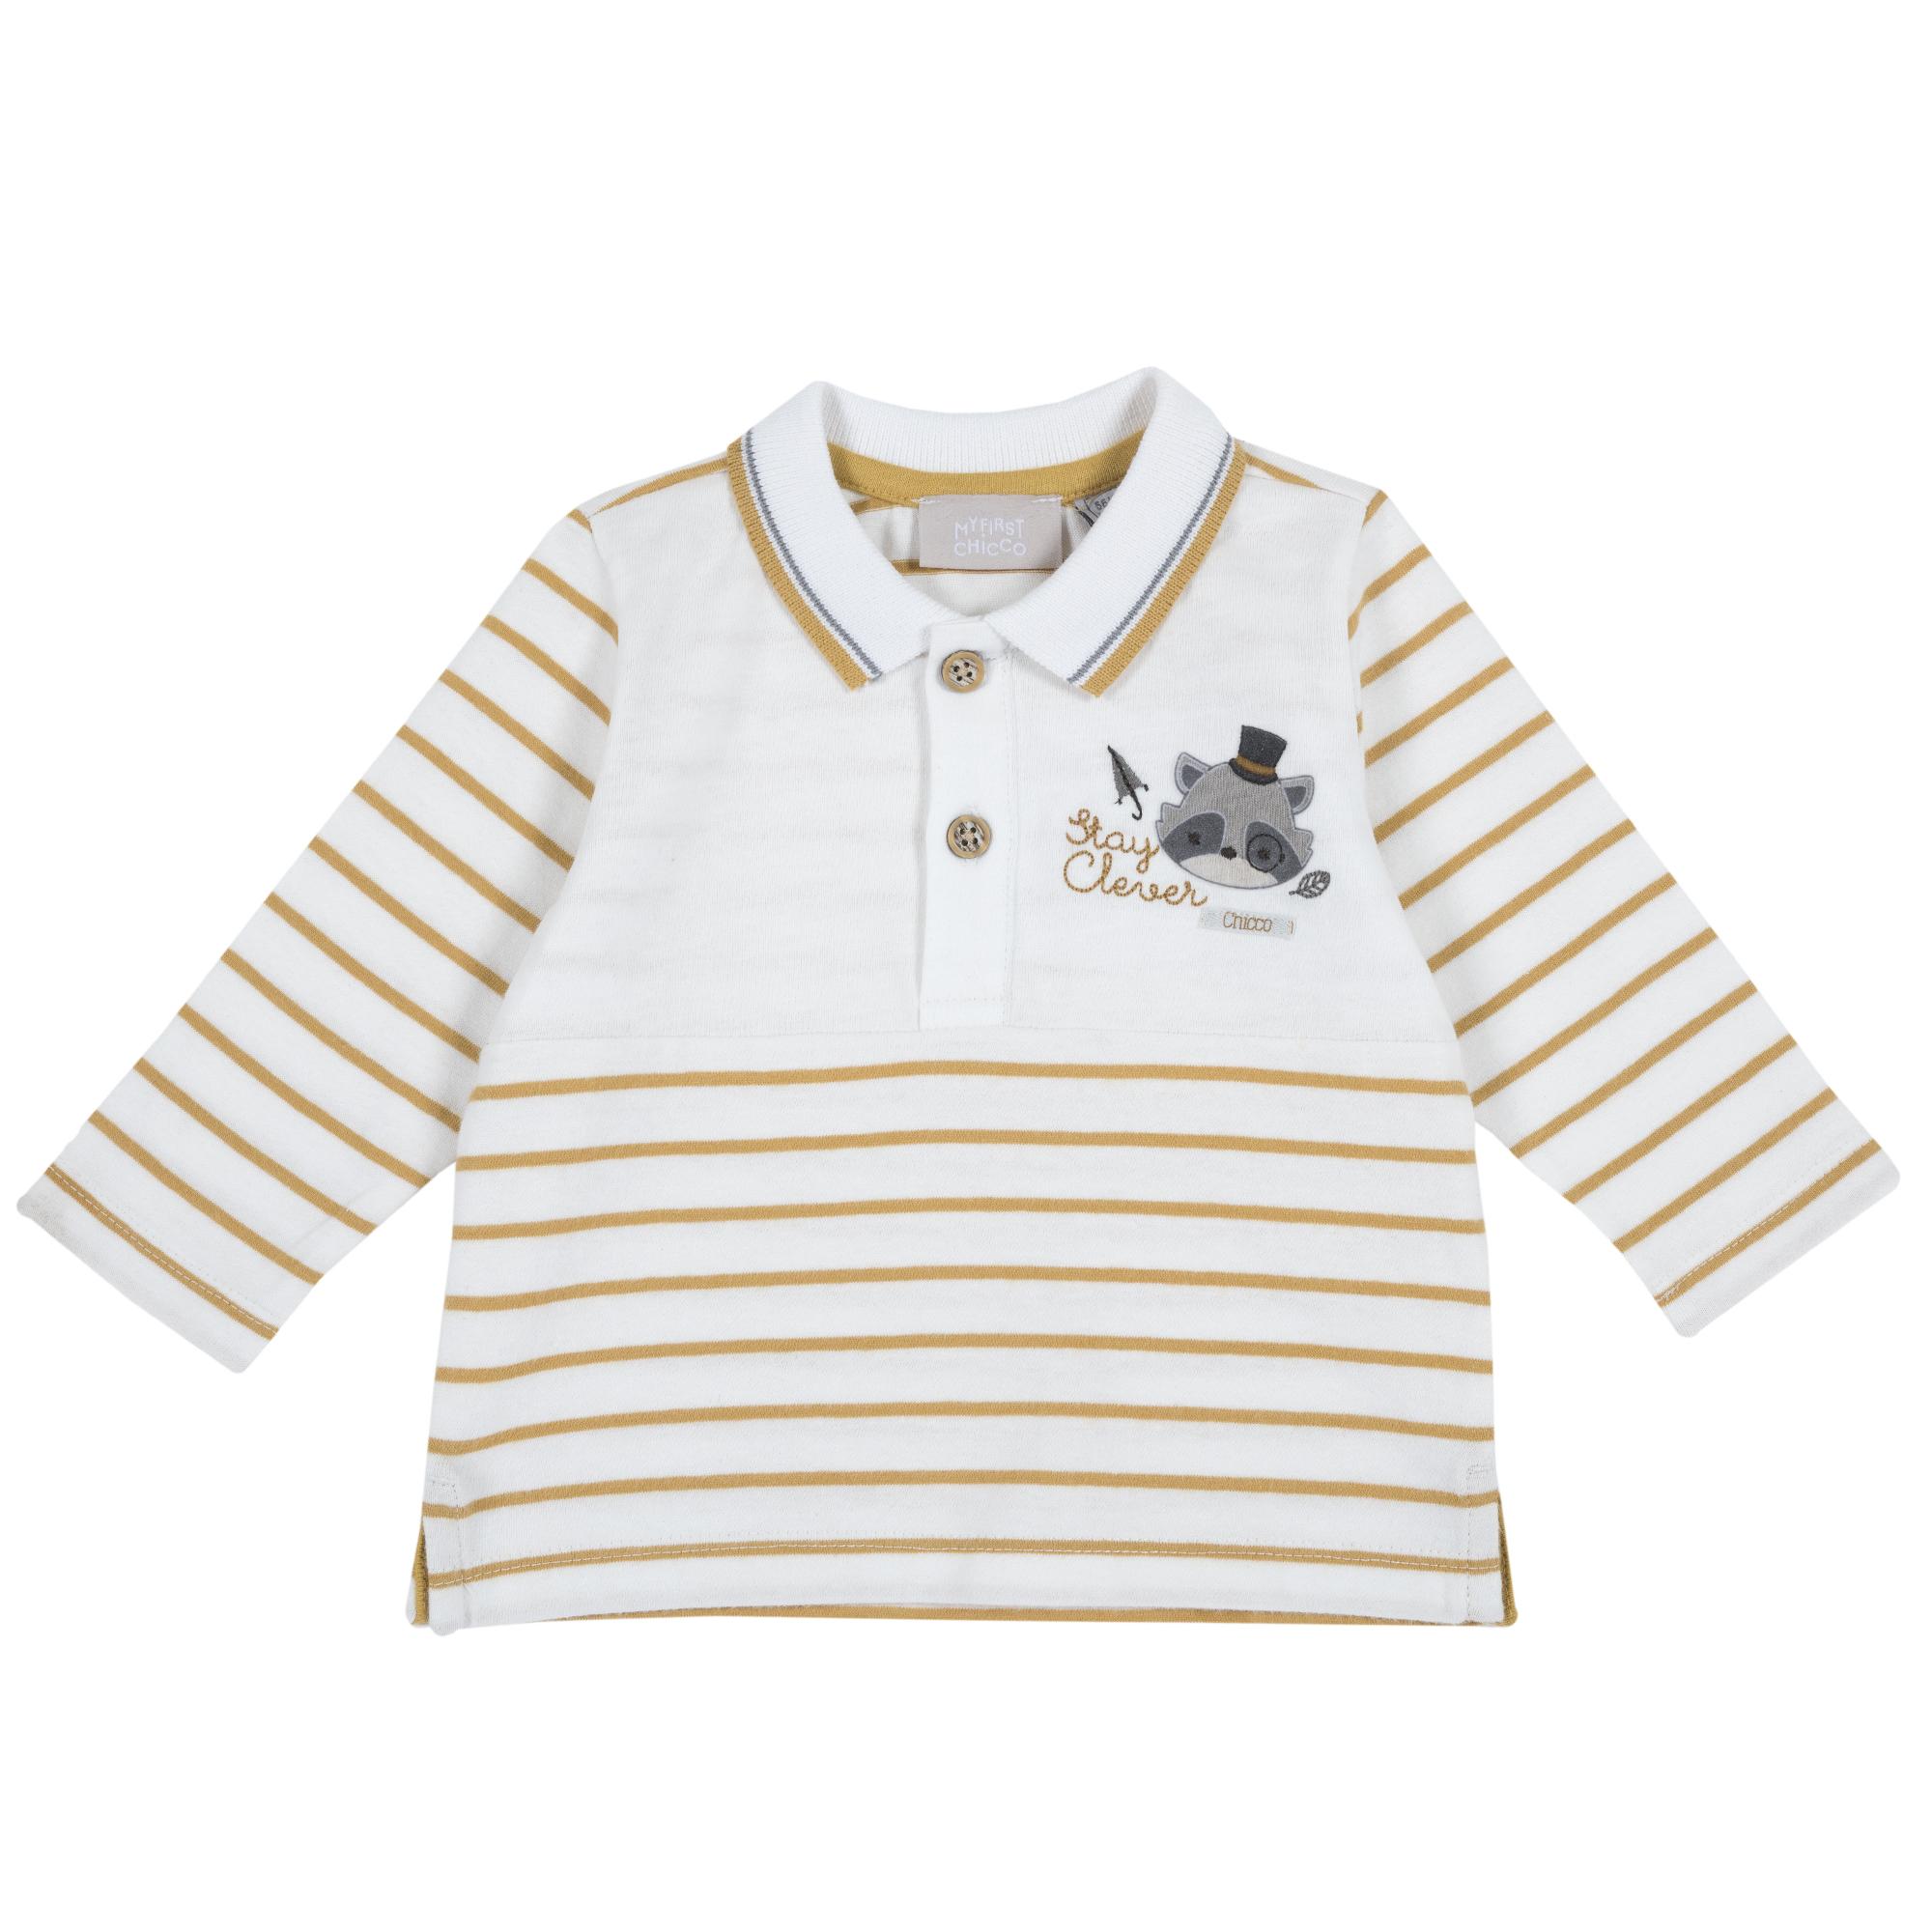 Tricou Copii Chicco, Maneca Lunga Si Guler, Maro, 33507